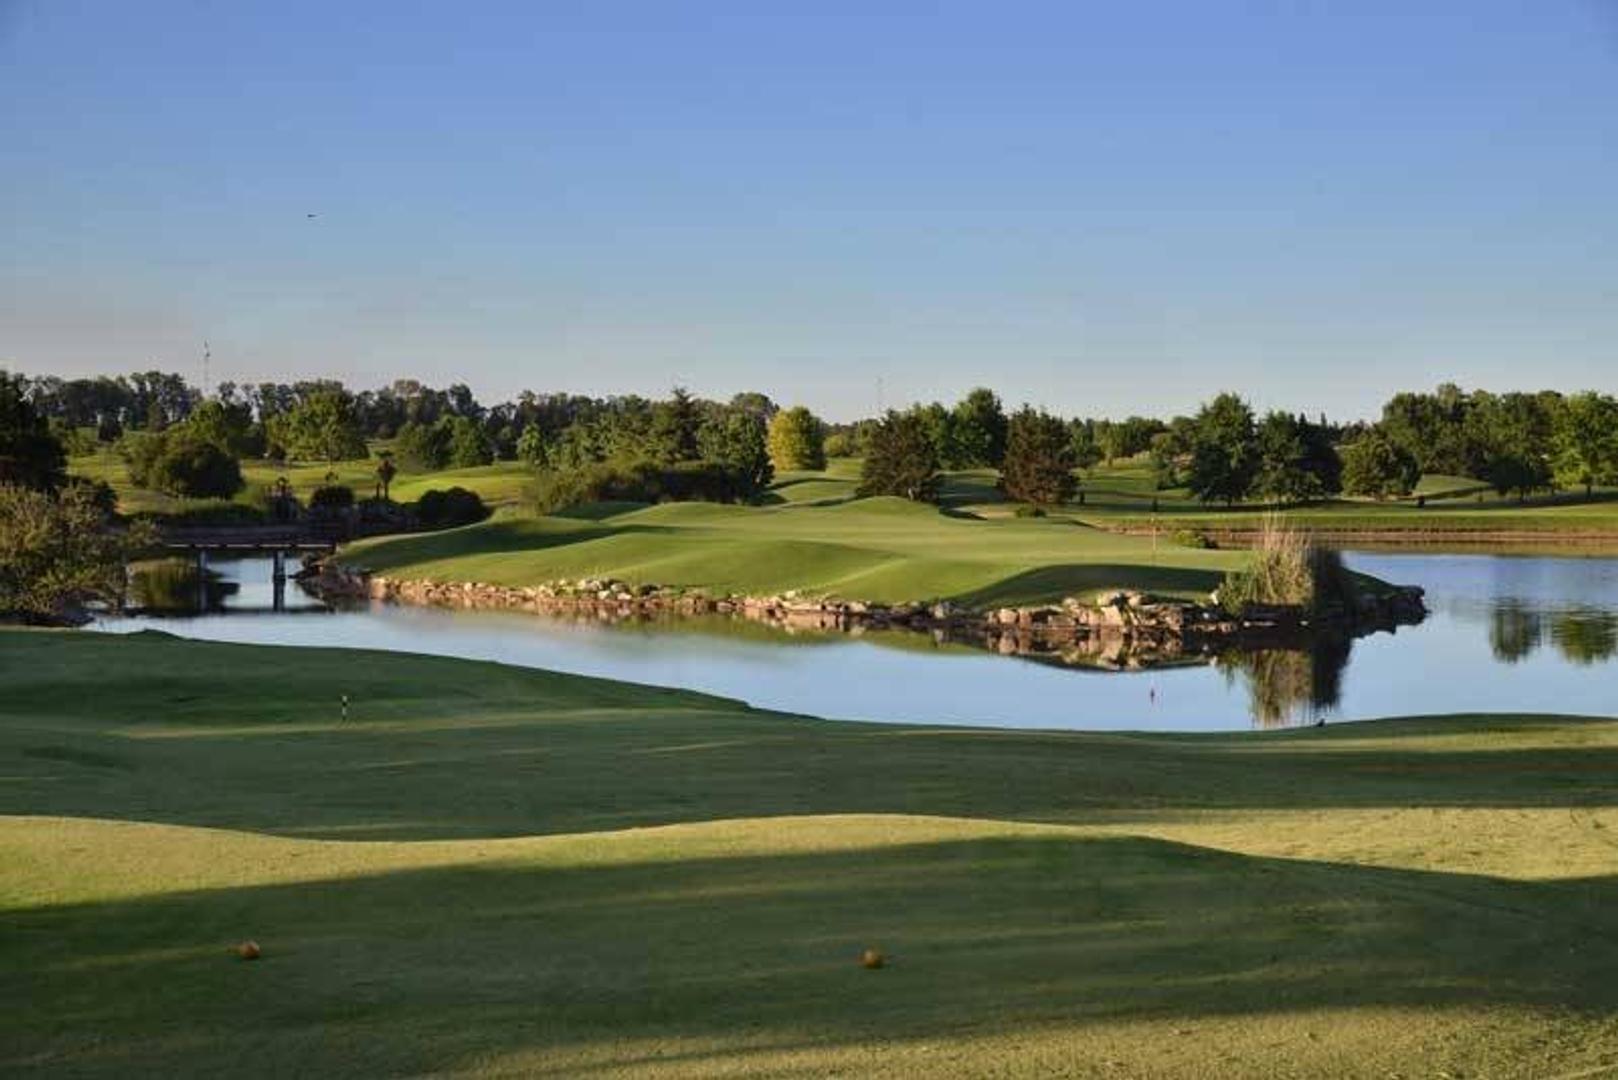 Venta de Lote en Pilar Golf -Pilar